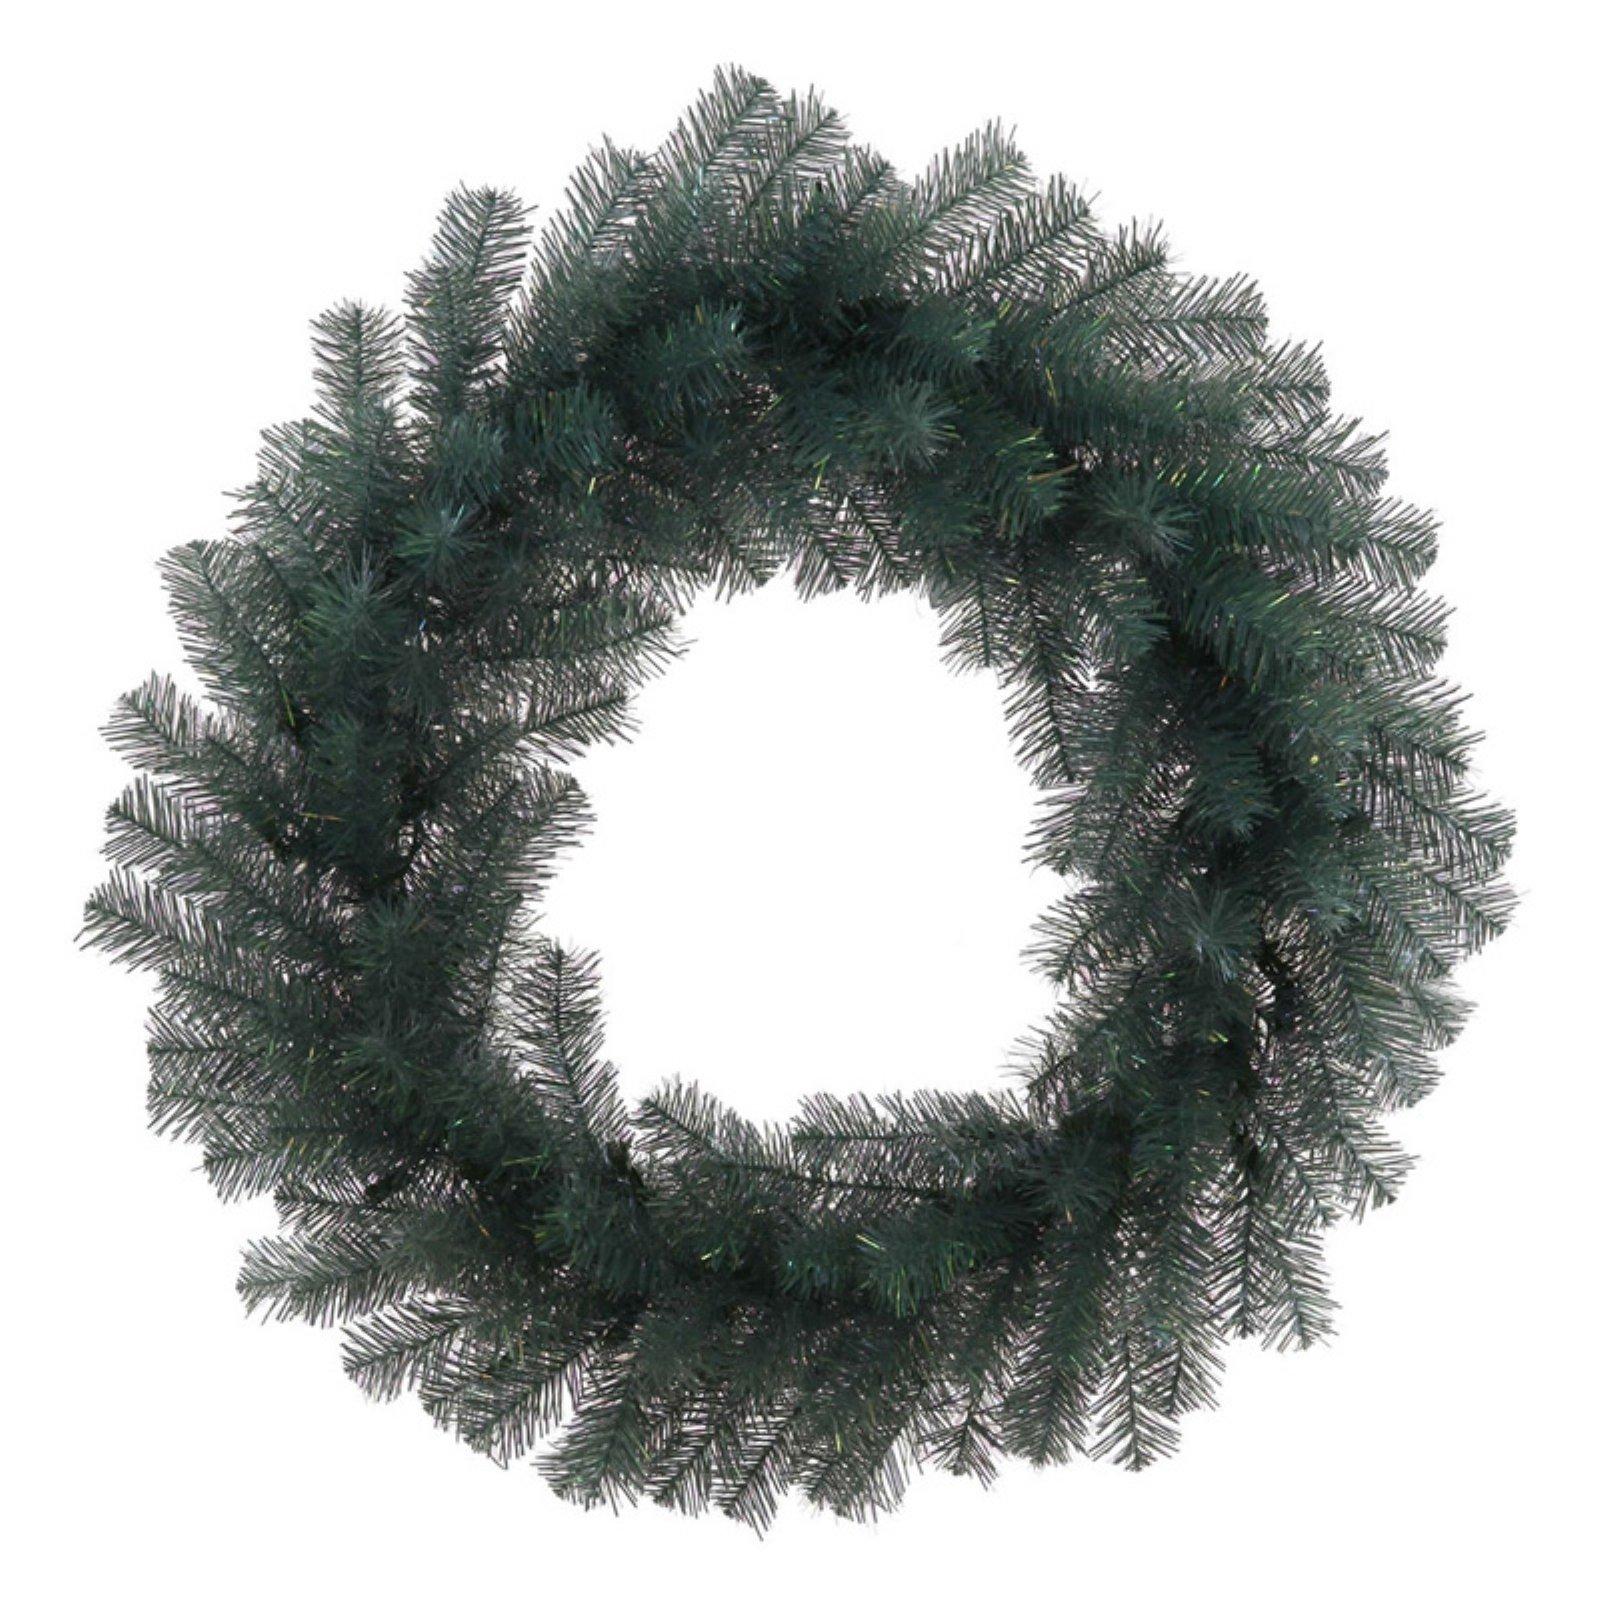 "Vickerman Unlit 24"" Blue Crystal Artificial Wreath featuring 150 PVC Tips"